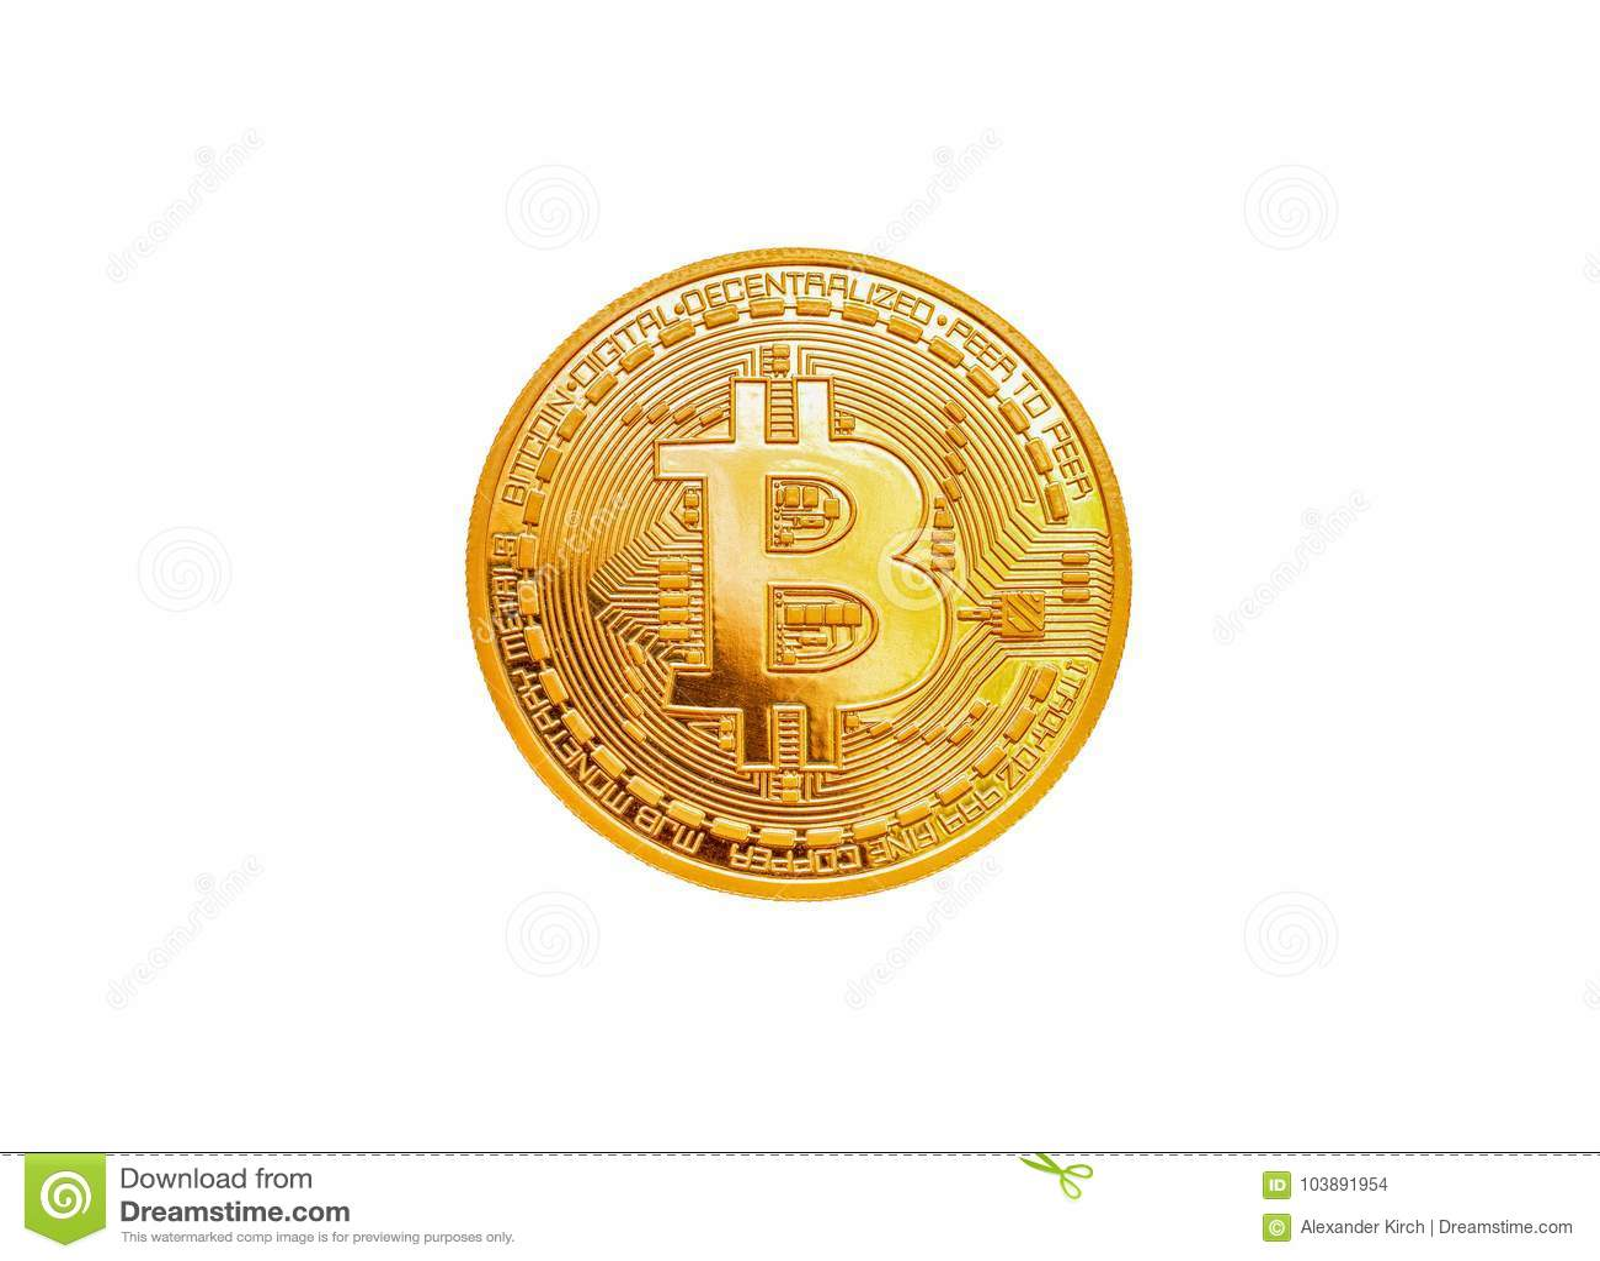 btc usd techninis metatrader demo bitcoin